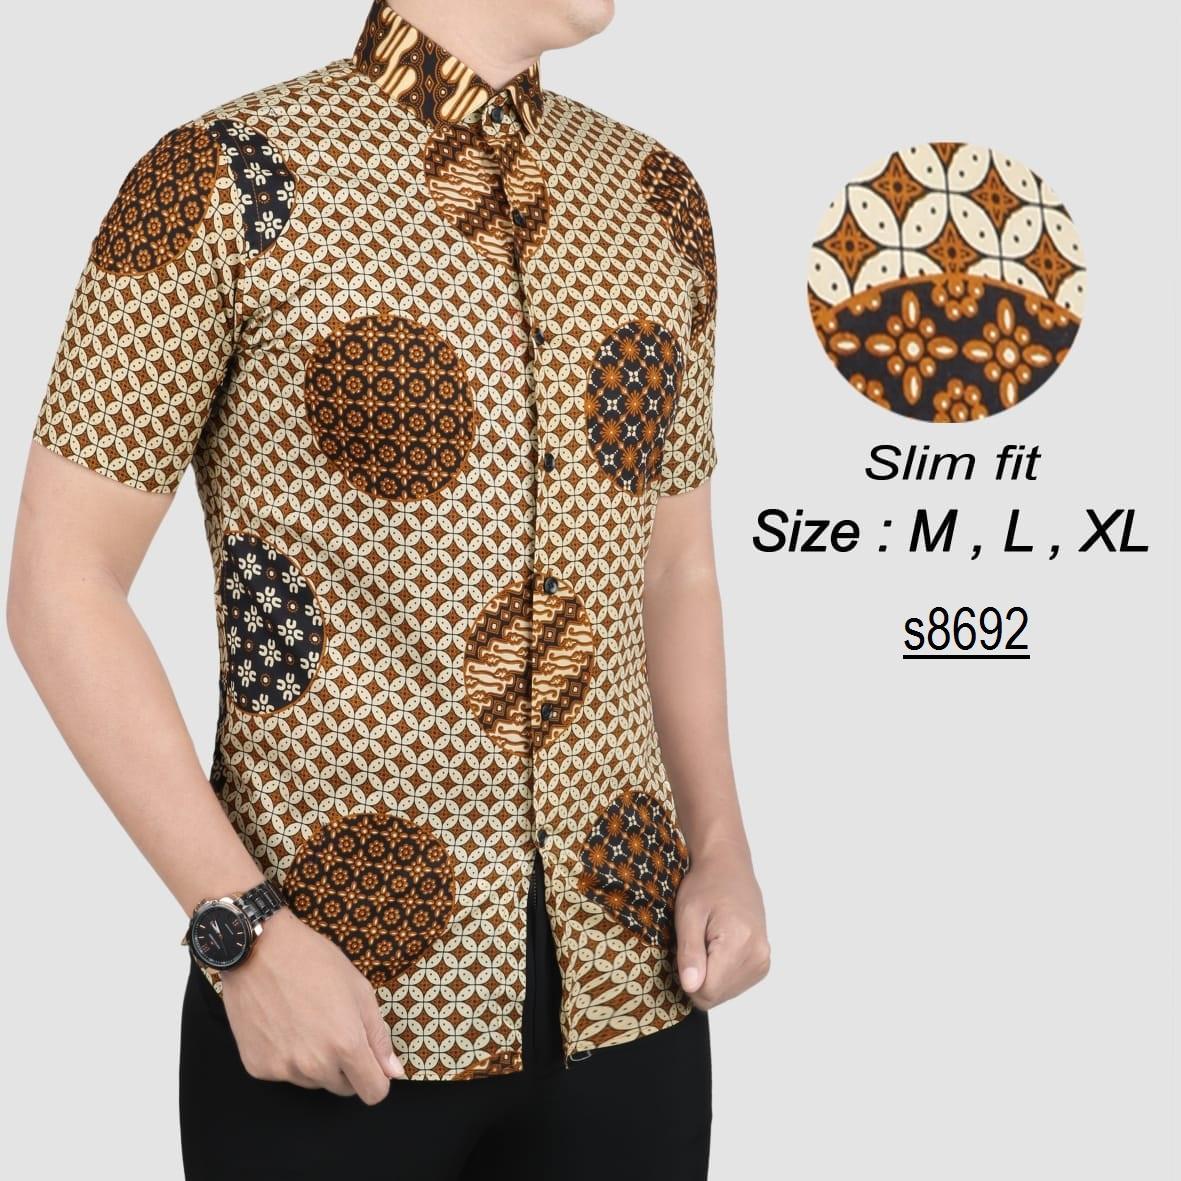 Batik Pria Modern Kemeja Batik Pria Slim fit s8692